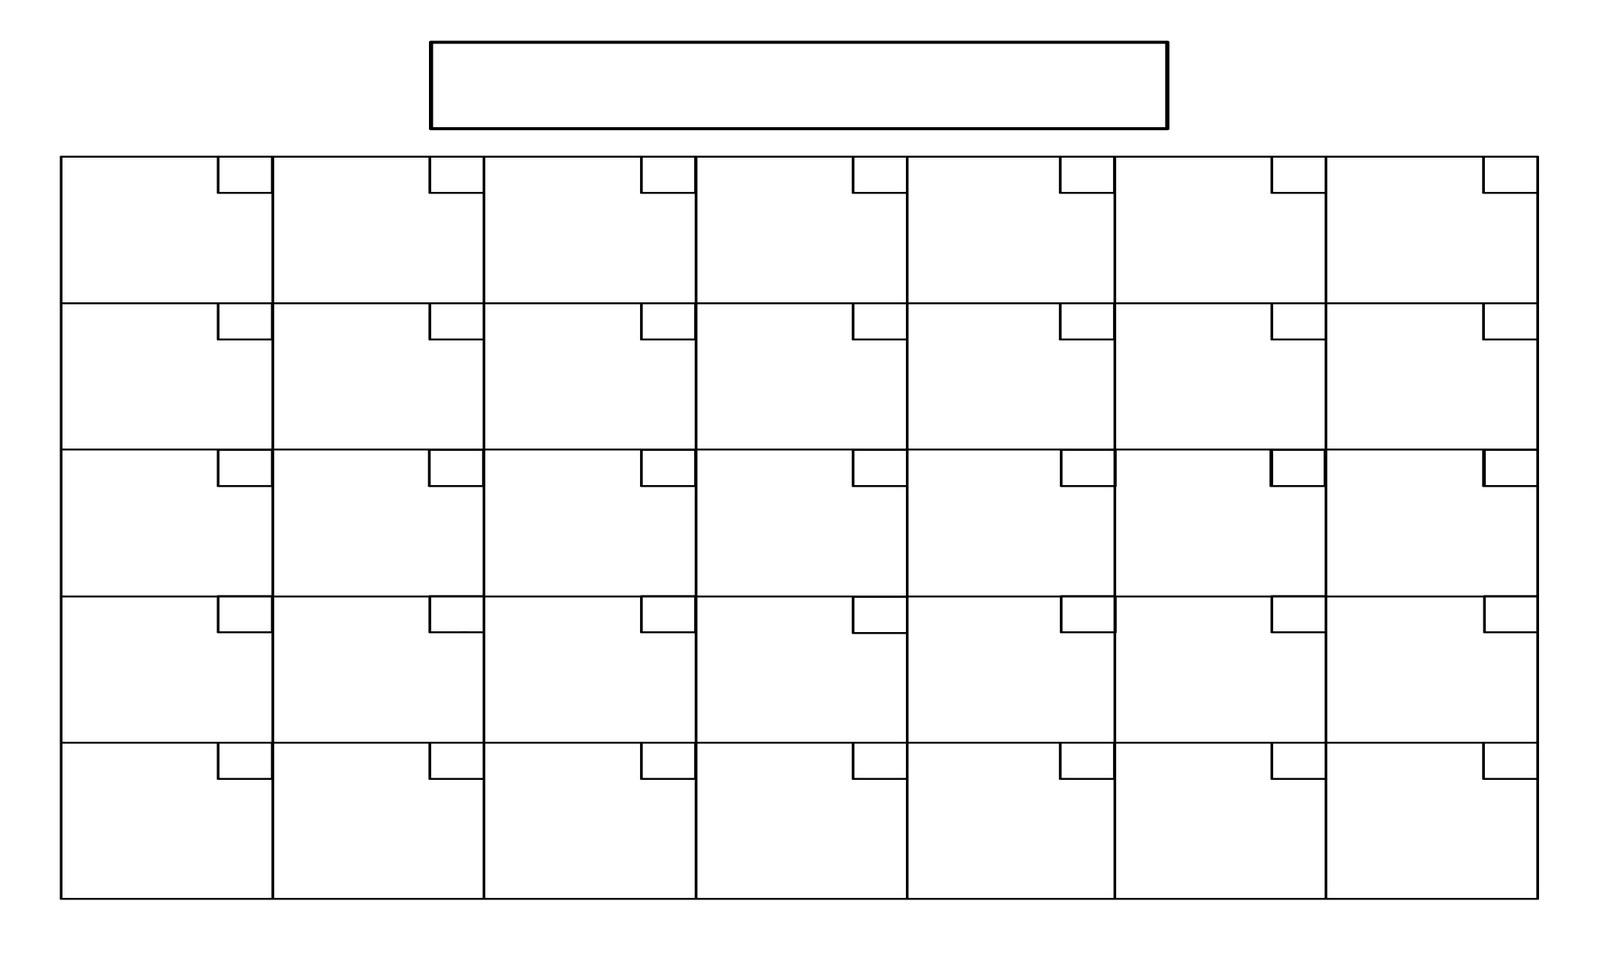 16 Simple Blank Calendar Template Images - Full Size Blank Printable inside Full Size Blank Printable Calendar